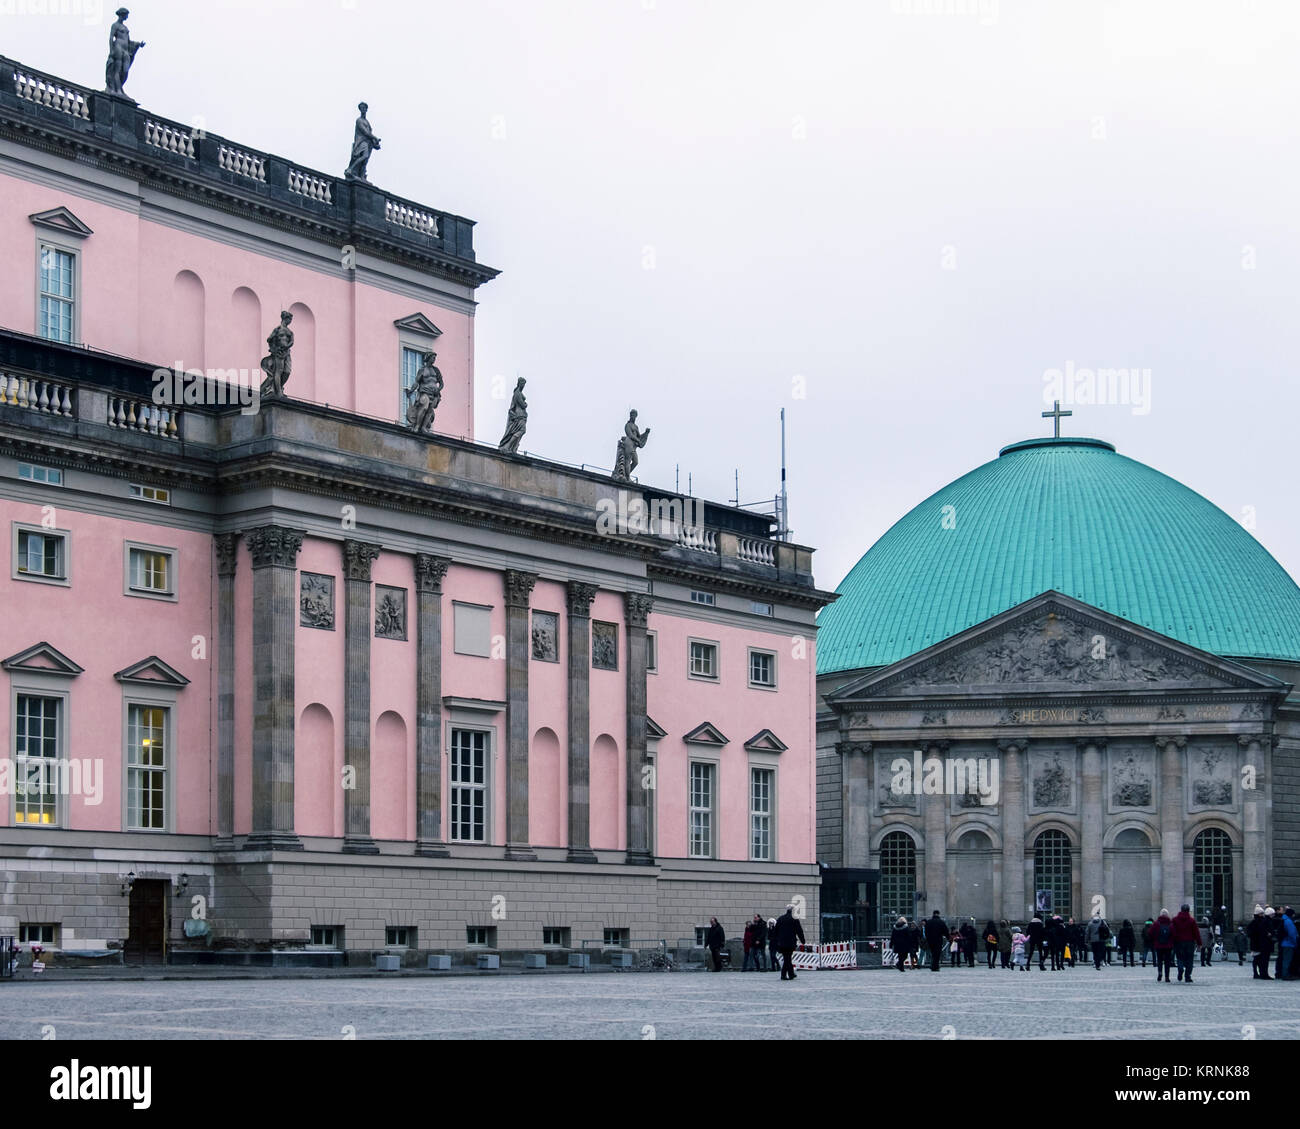 Berlin State Opera Unter Den Linden Stock Photos & Berlin ...